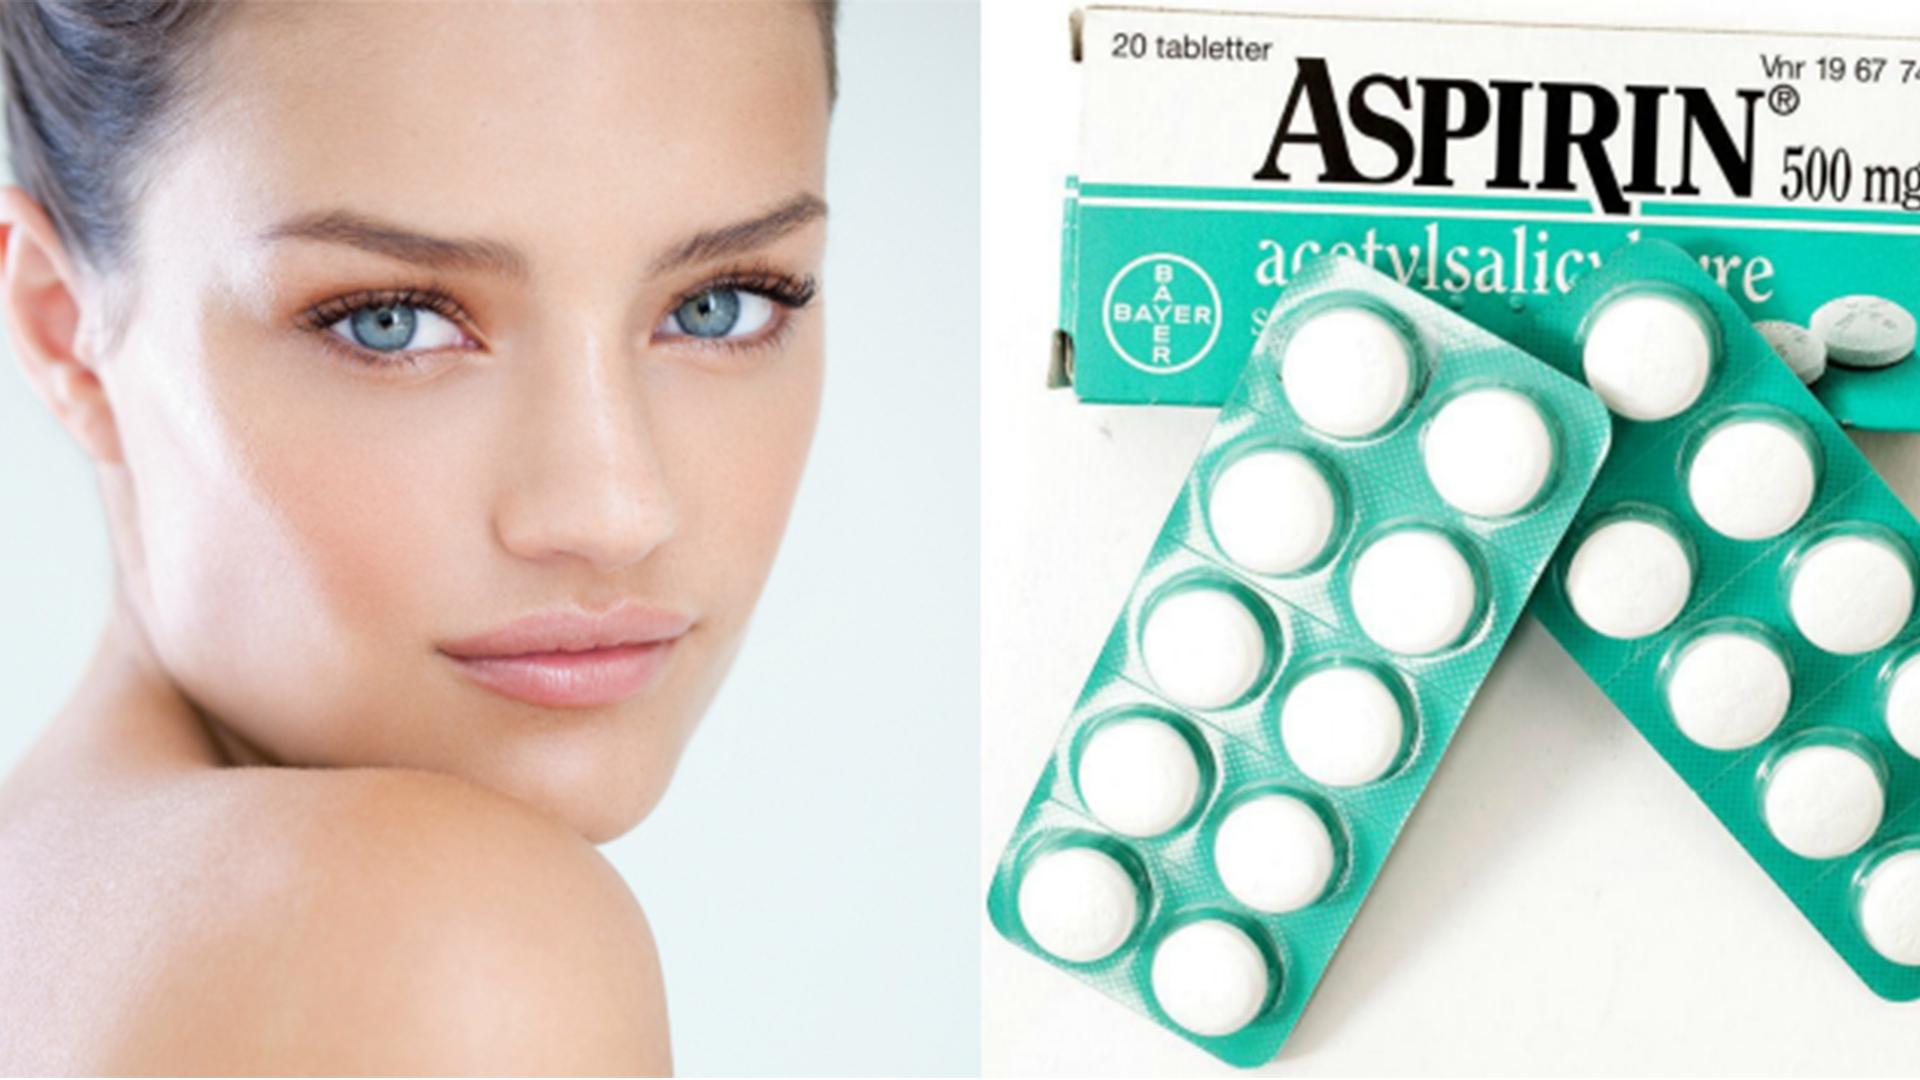 Воздействие аспирина на кожу лица